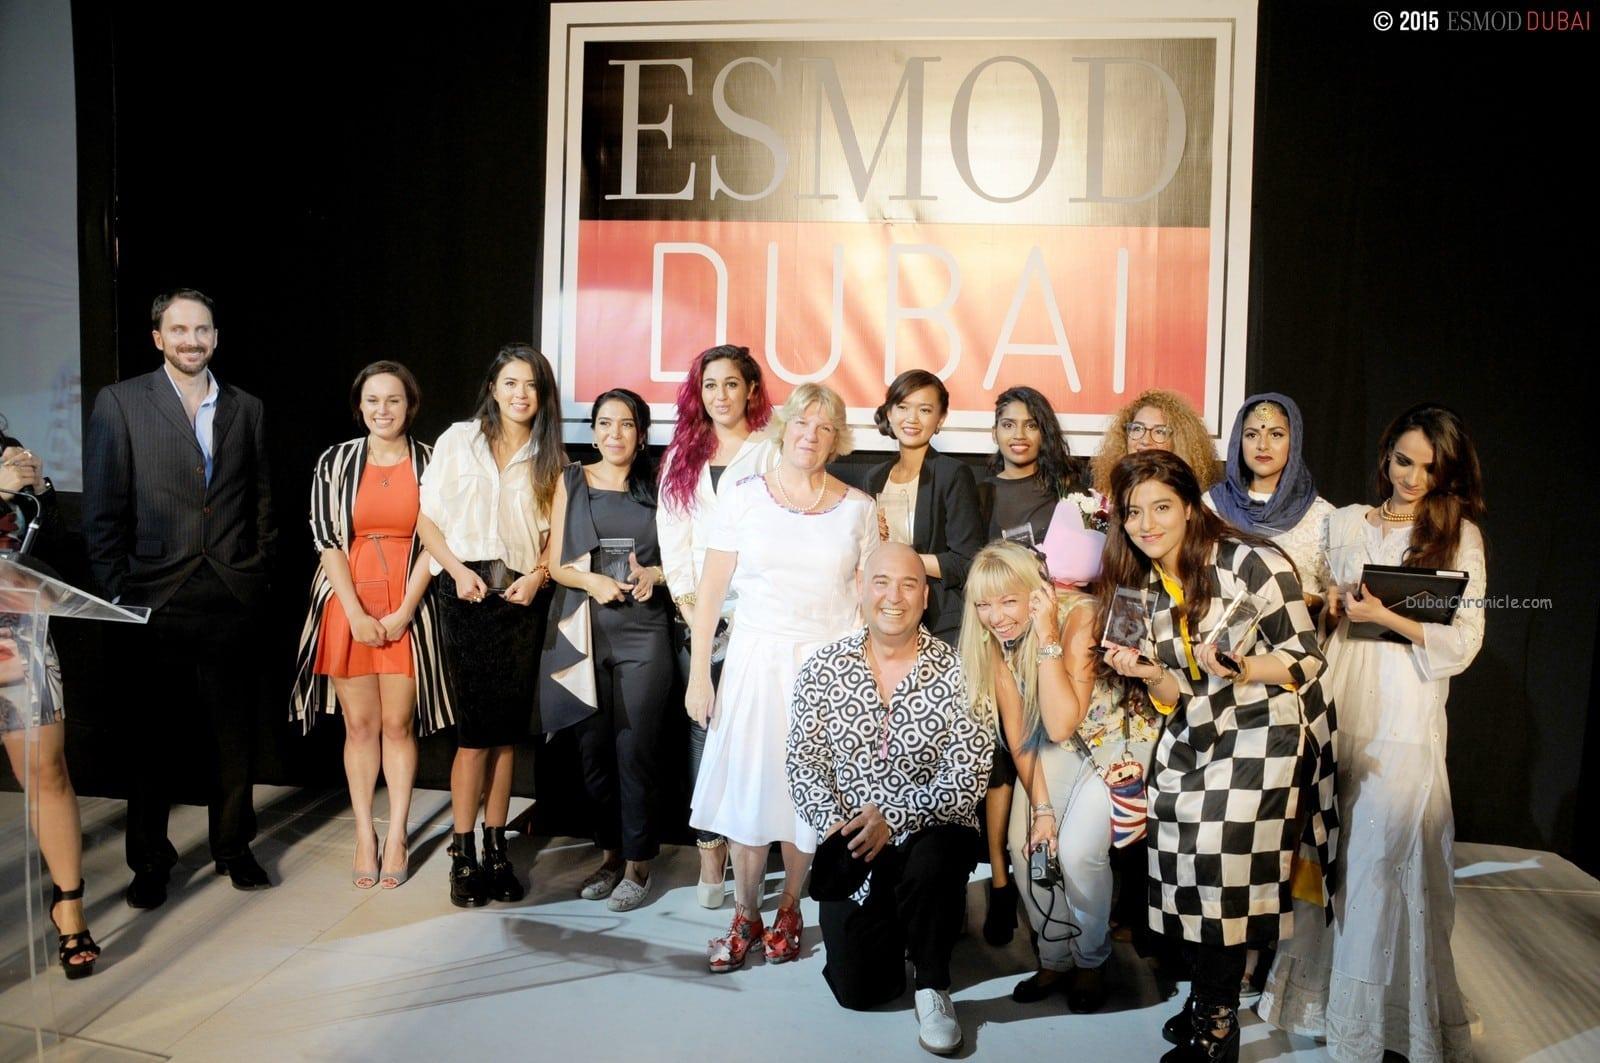 ESMOD Dubai 2015 Fashion Show - fashion graduates